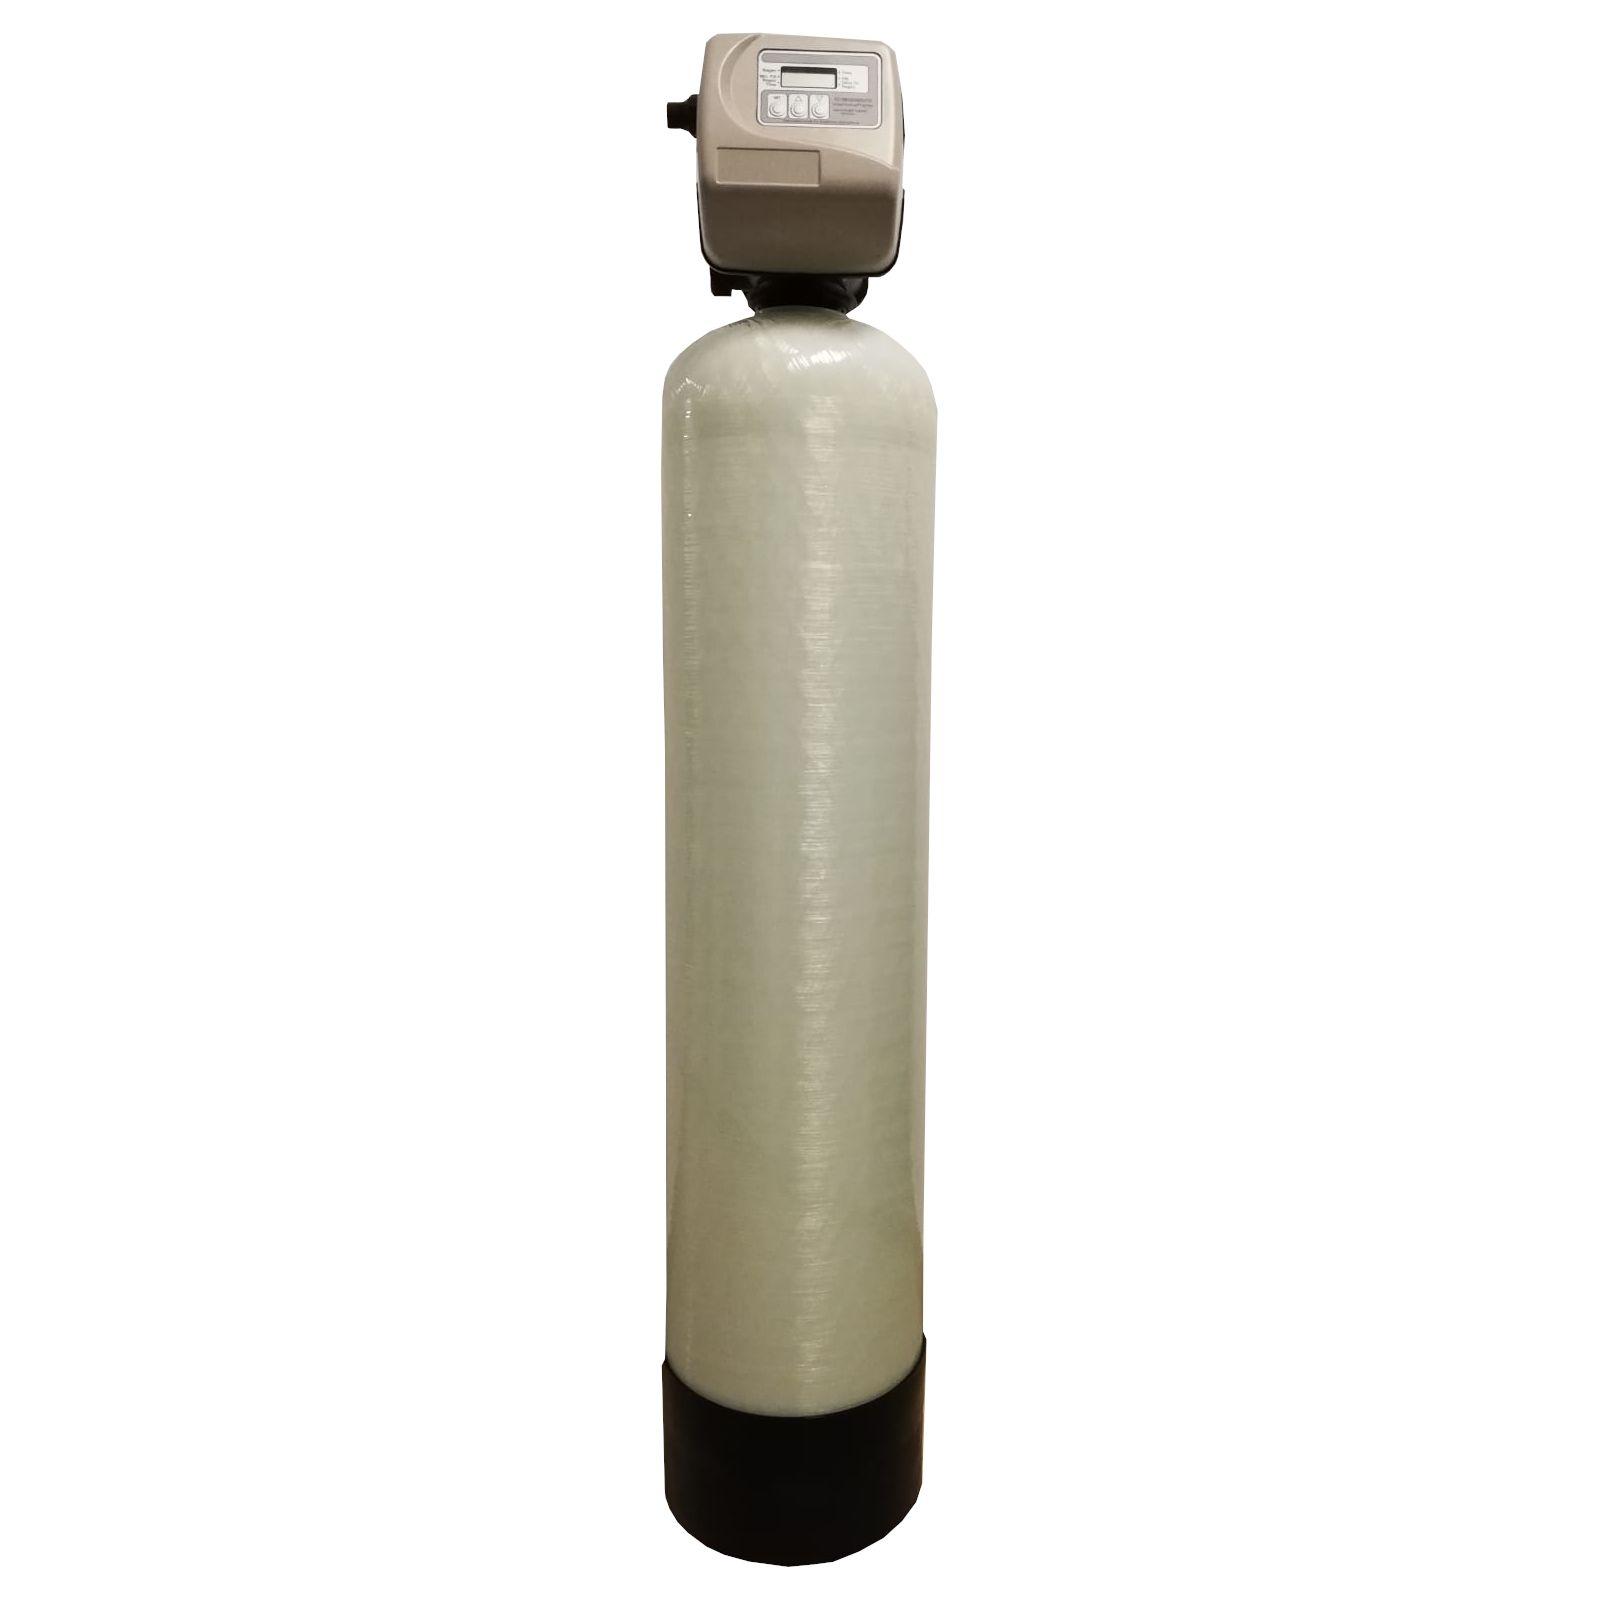 Filtru apa automat Aqua AG+Clack SUA TC 40, Debit 1.25 mc/h, Capacitate filtrare 26.000 litri, Cartus din Rasina  - AquaFilters.ro